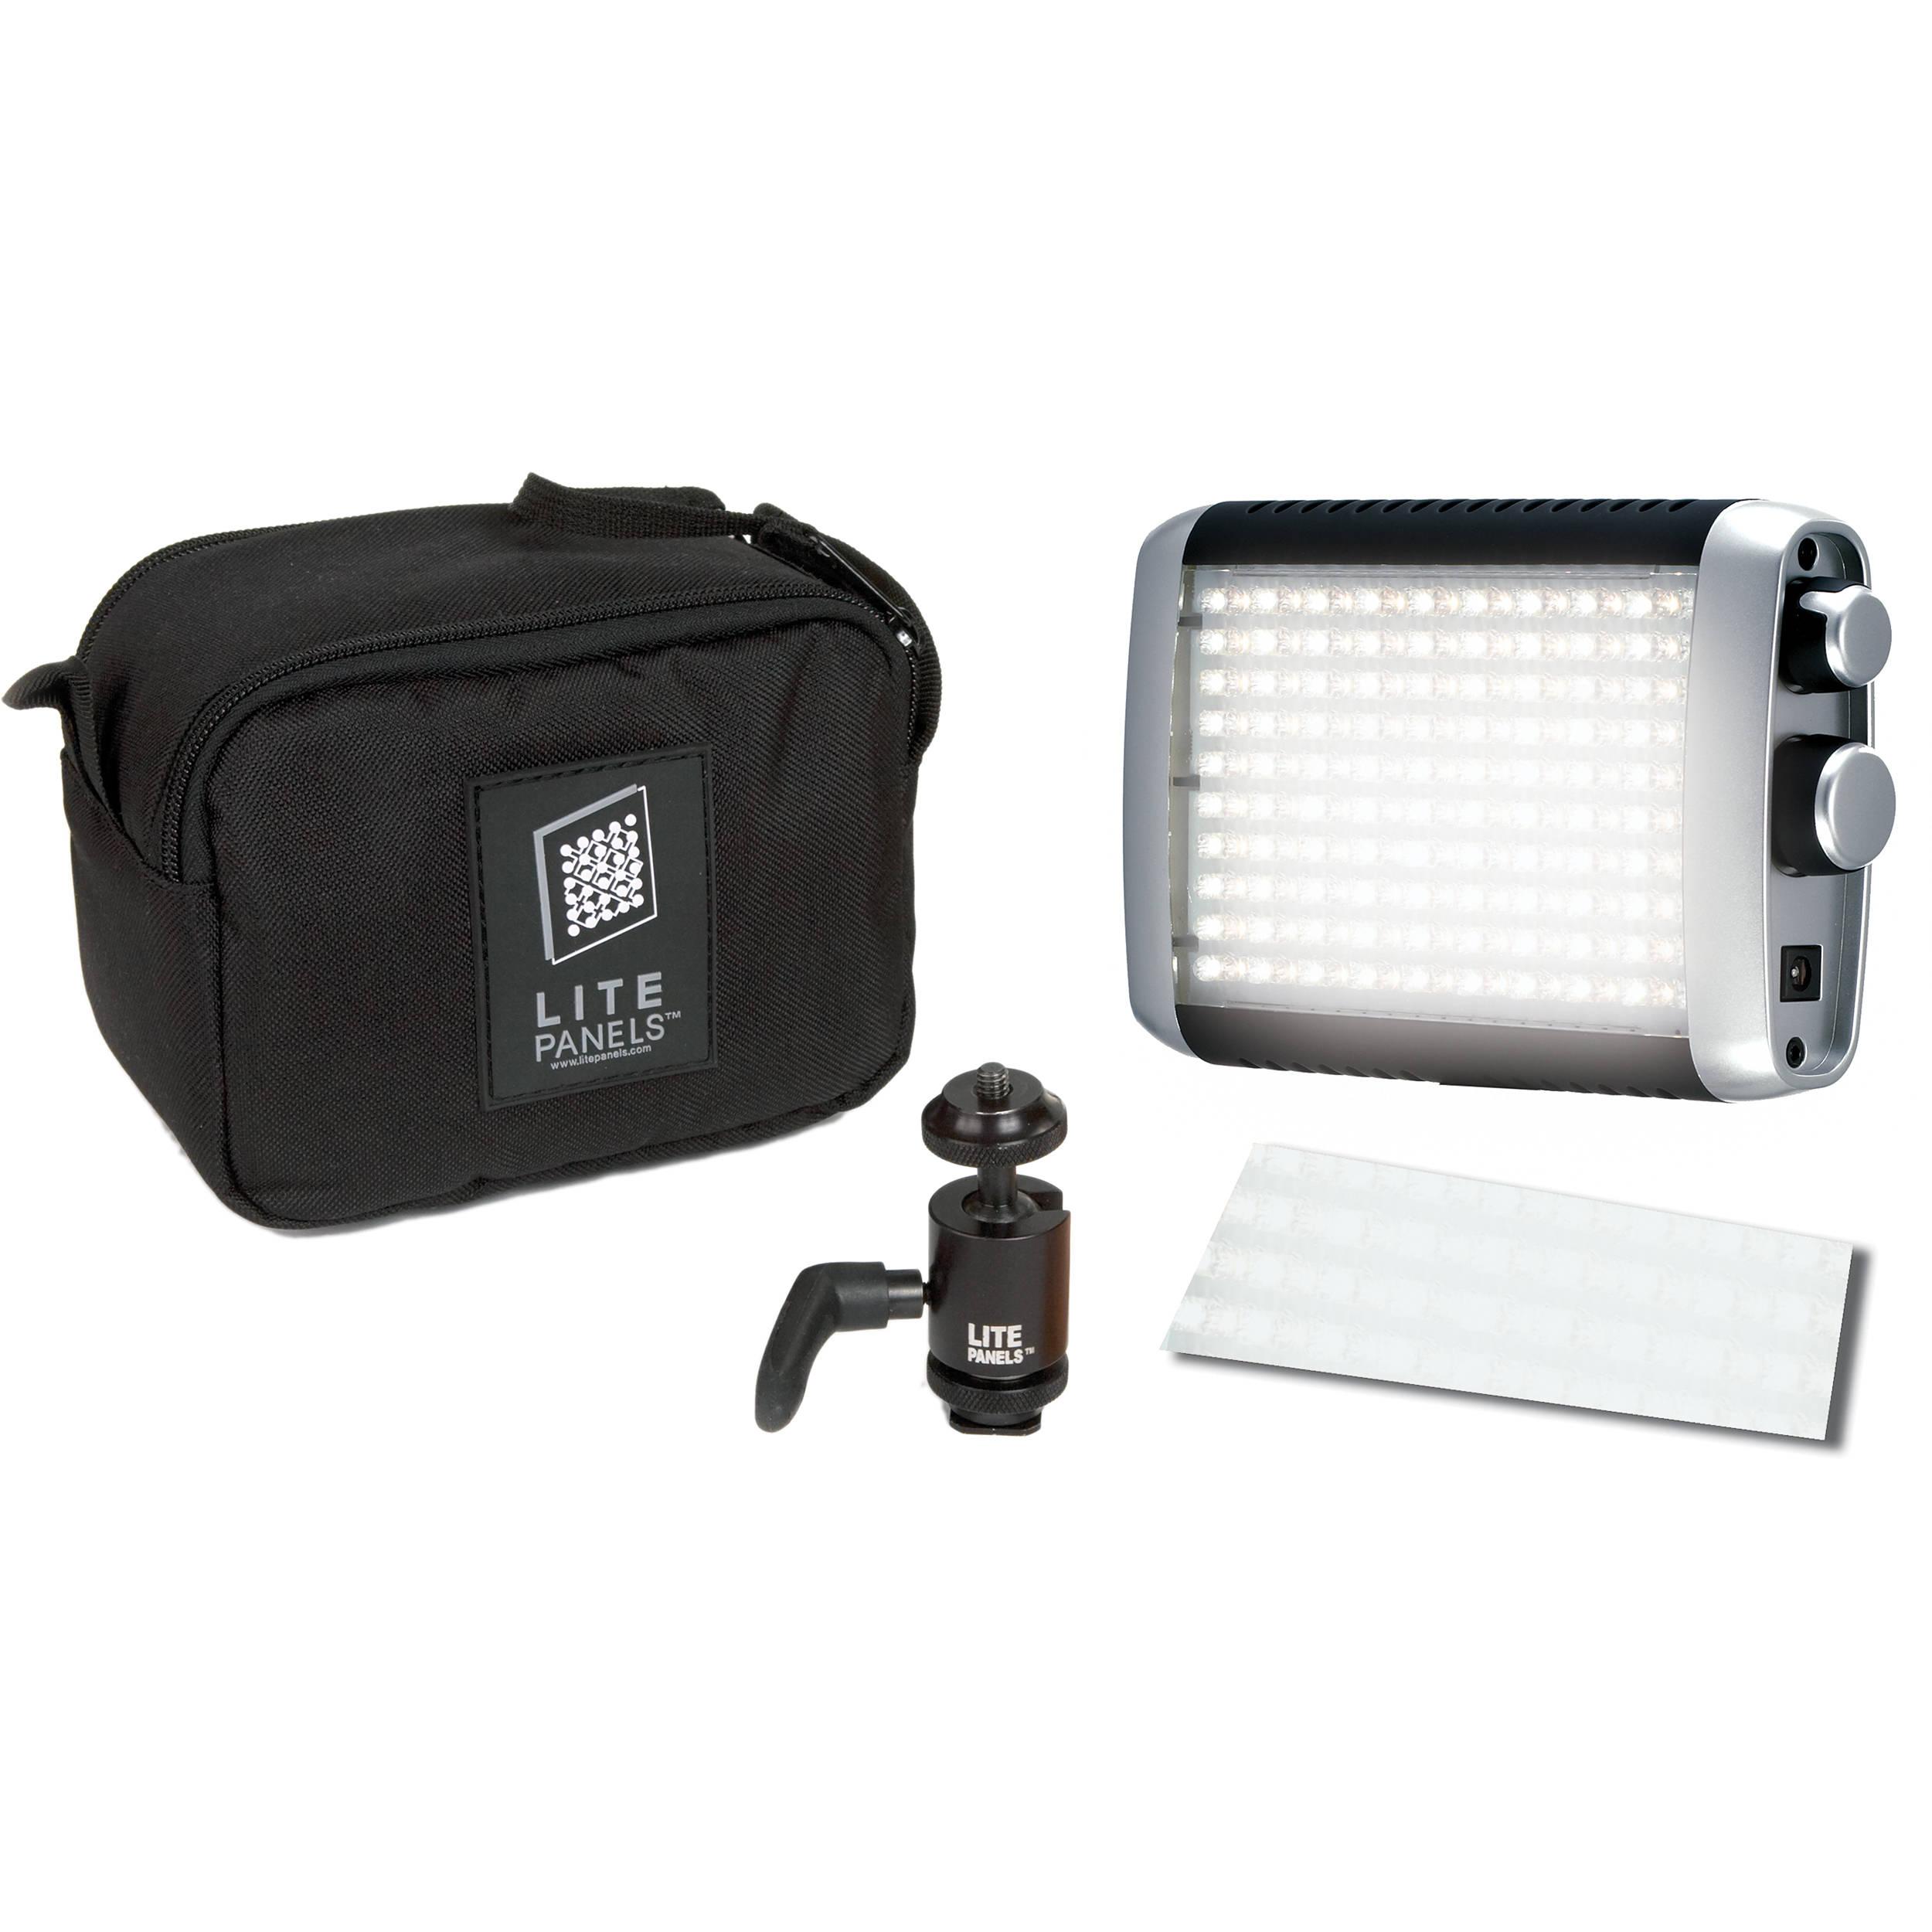 Litepanels Croma On-Camera LED Light 905-4023 B&H Photo Video